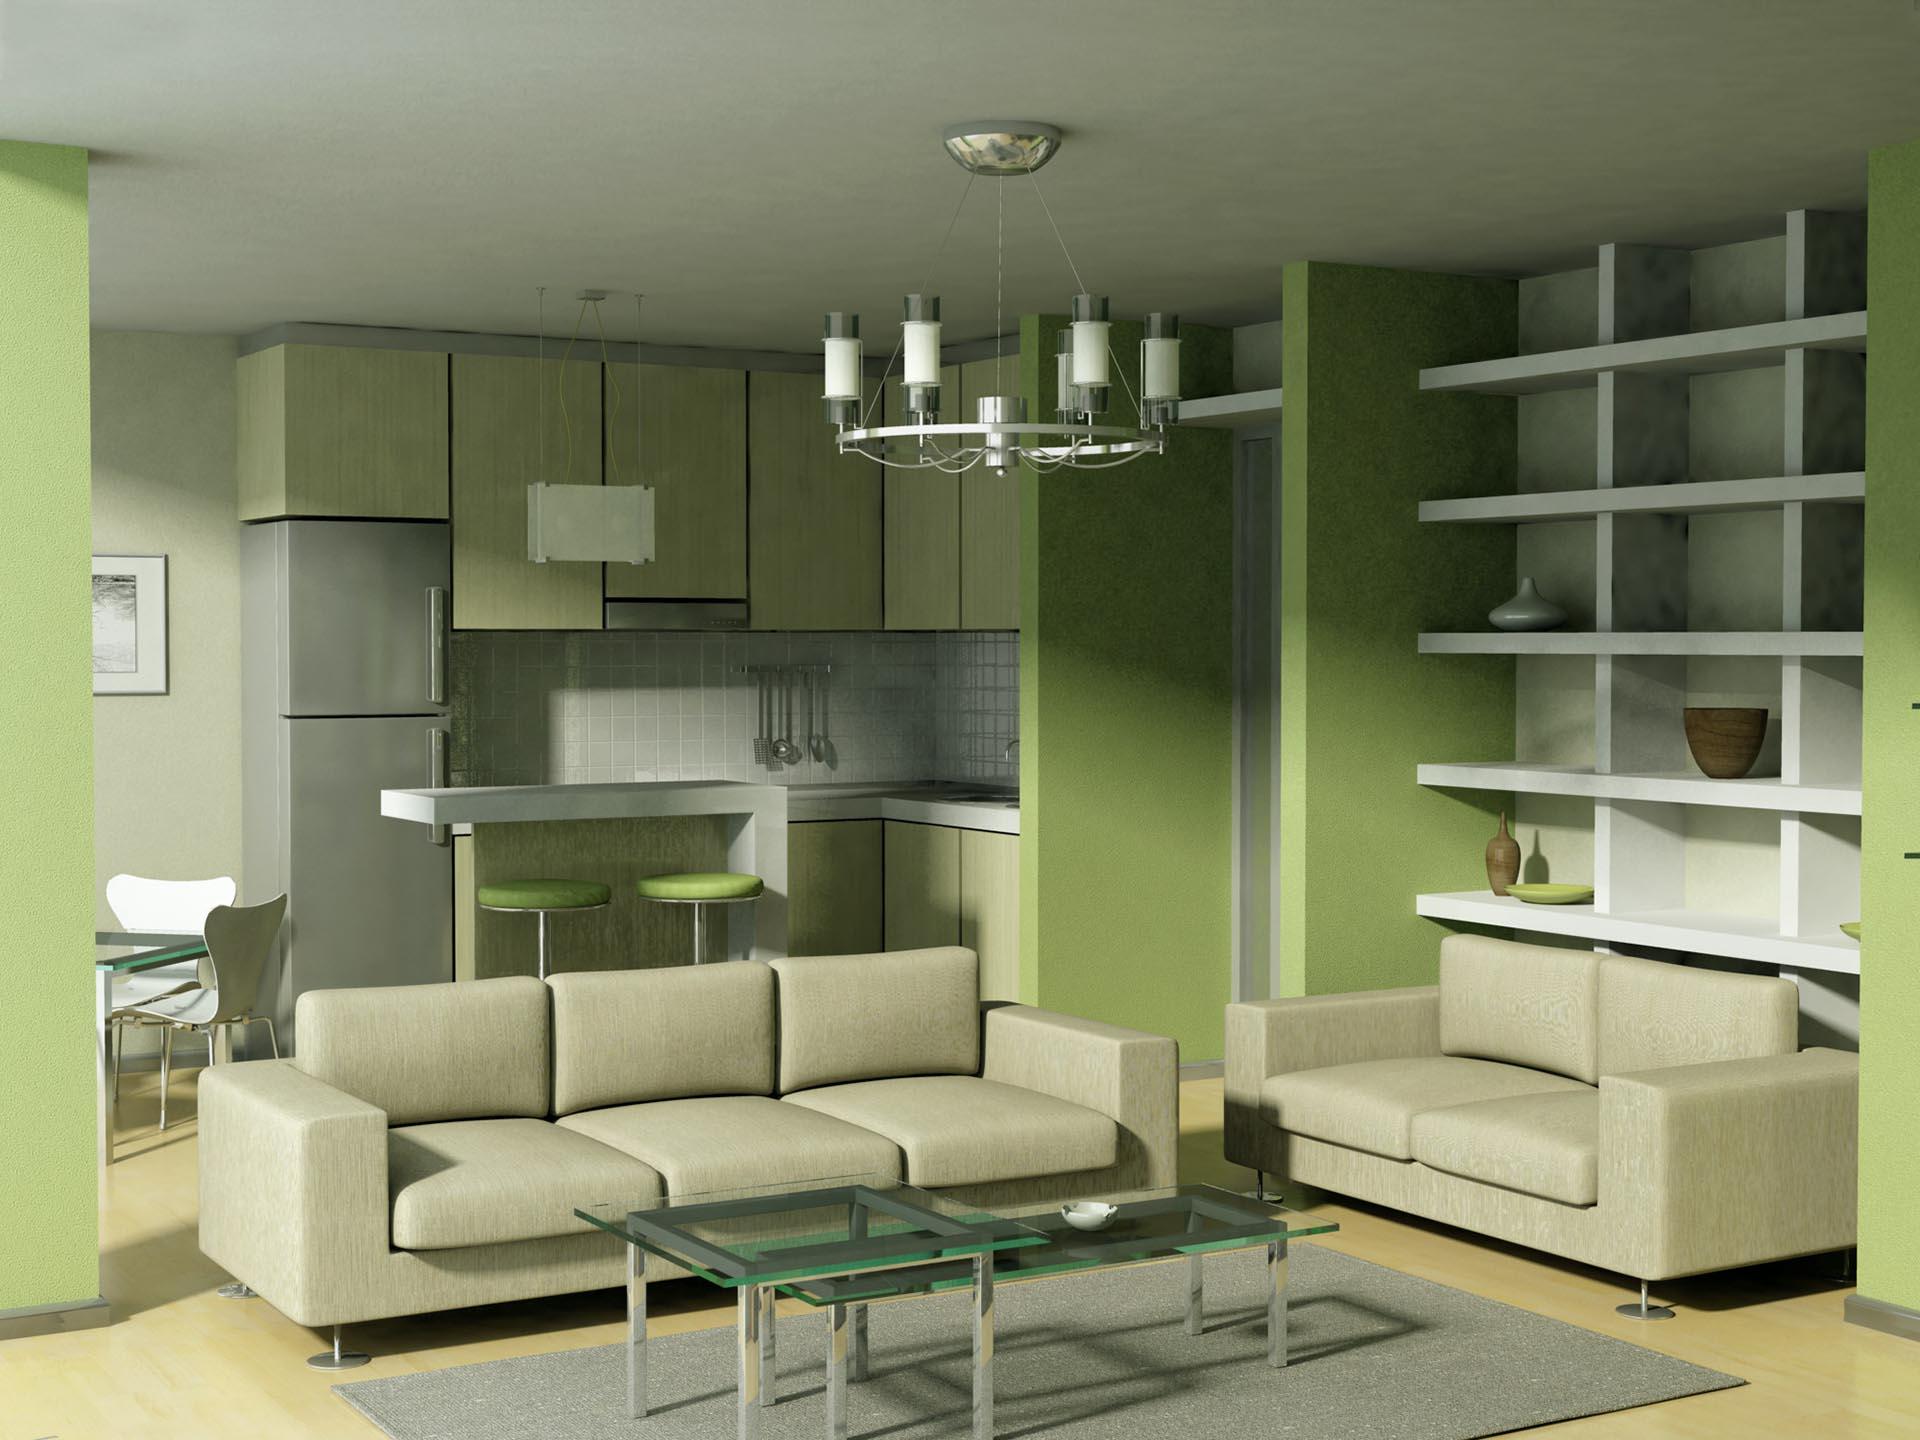 Shtinkovi Apartment 02